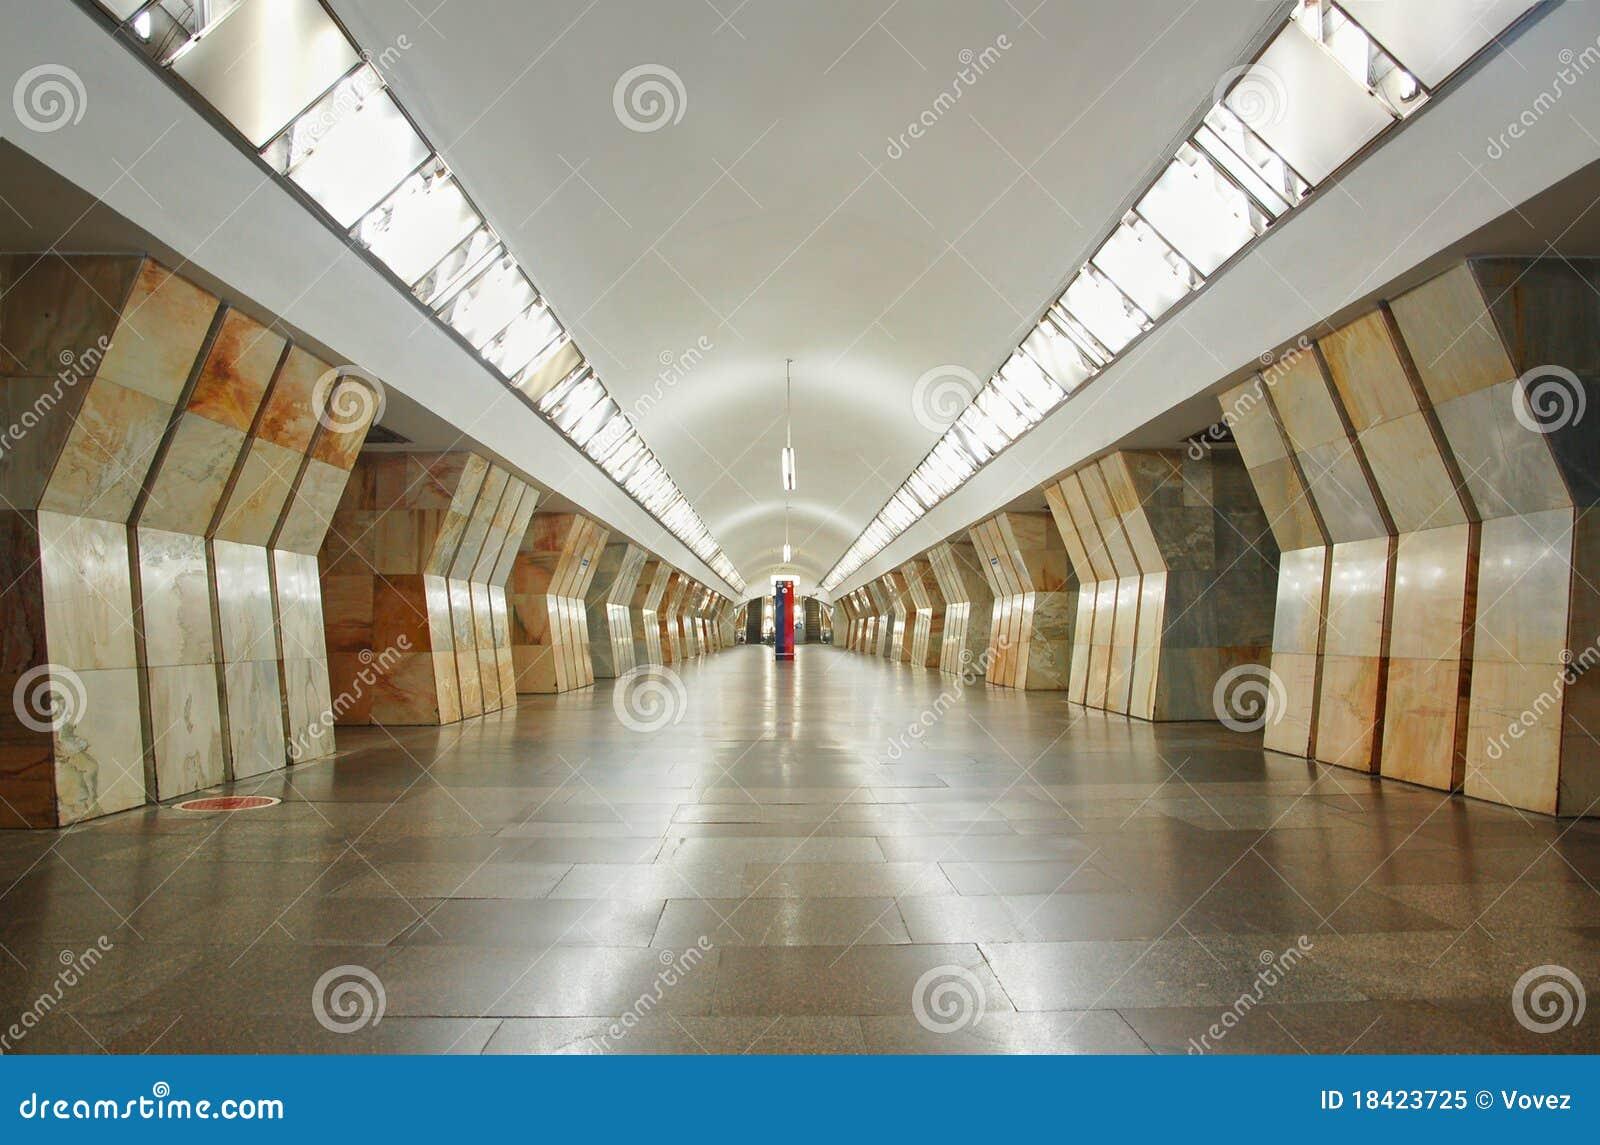 station sukharevskaya in der moskau metro stockbild bild von metro fu boden 18423725. Black Bedroom Furniture Sets. Home Design Ideas